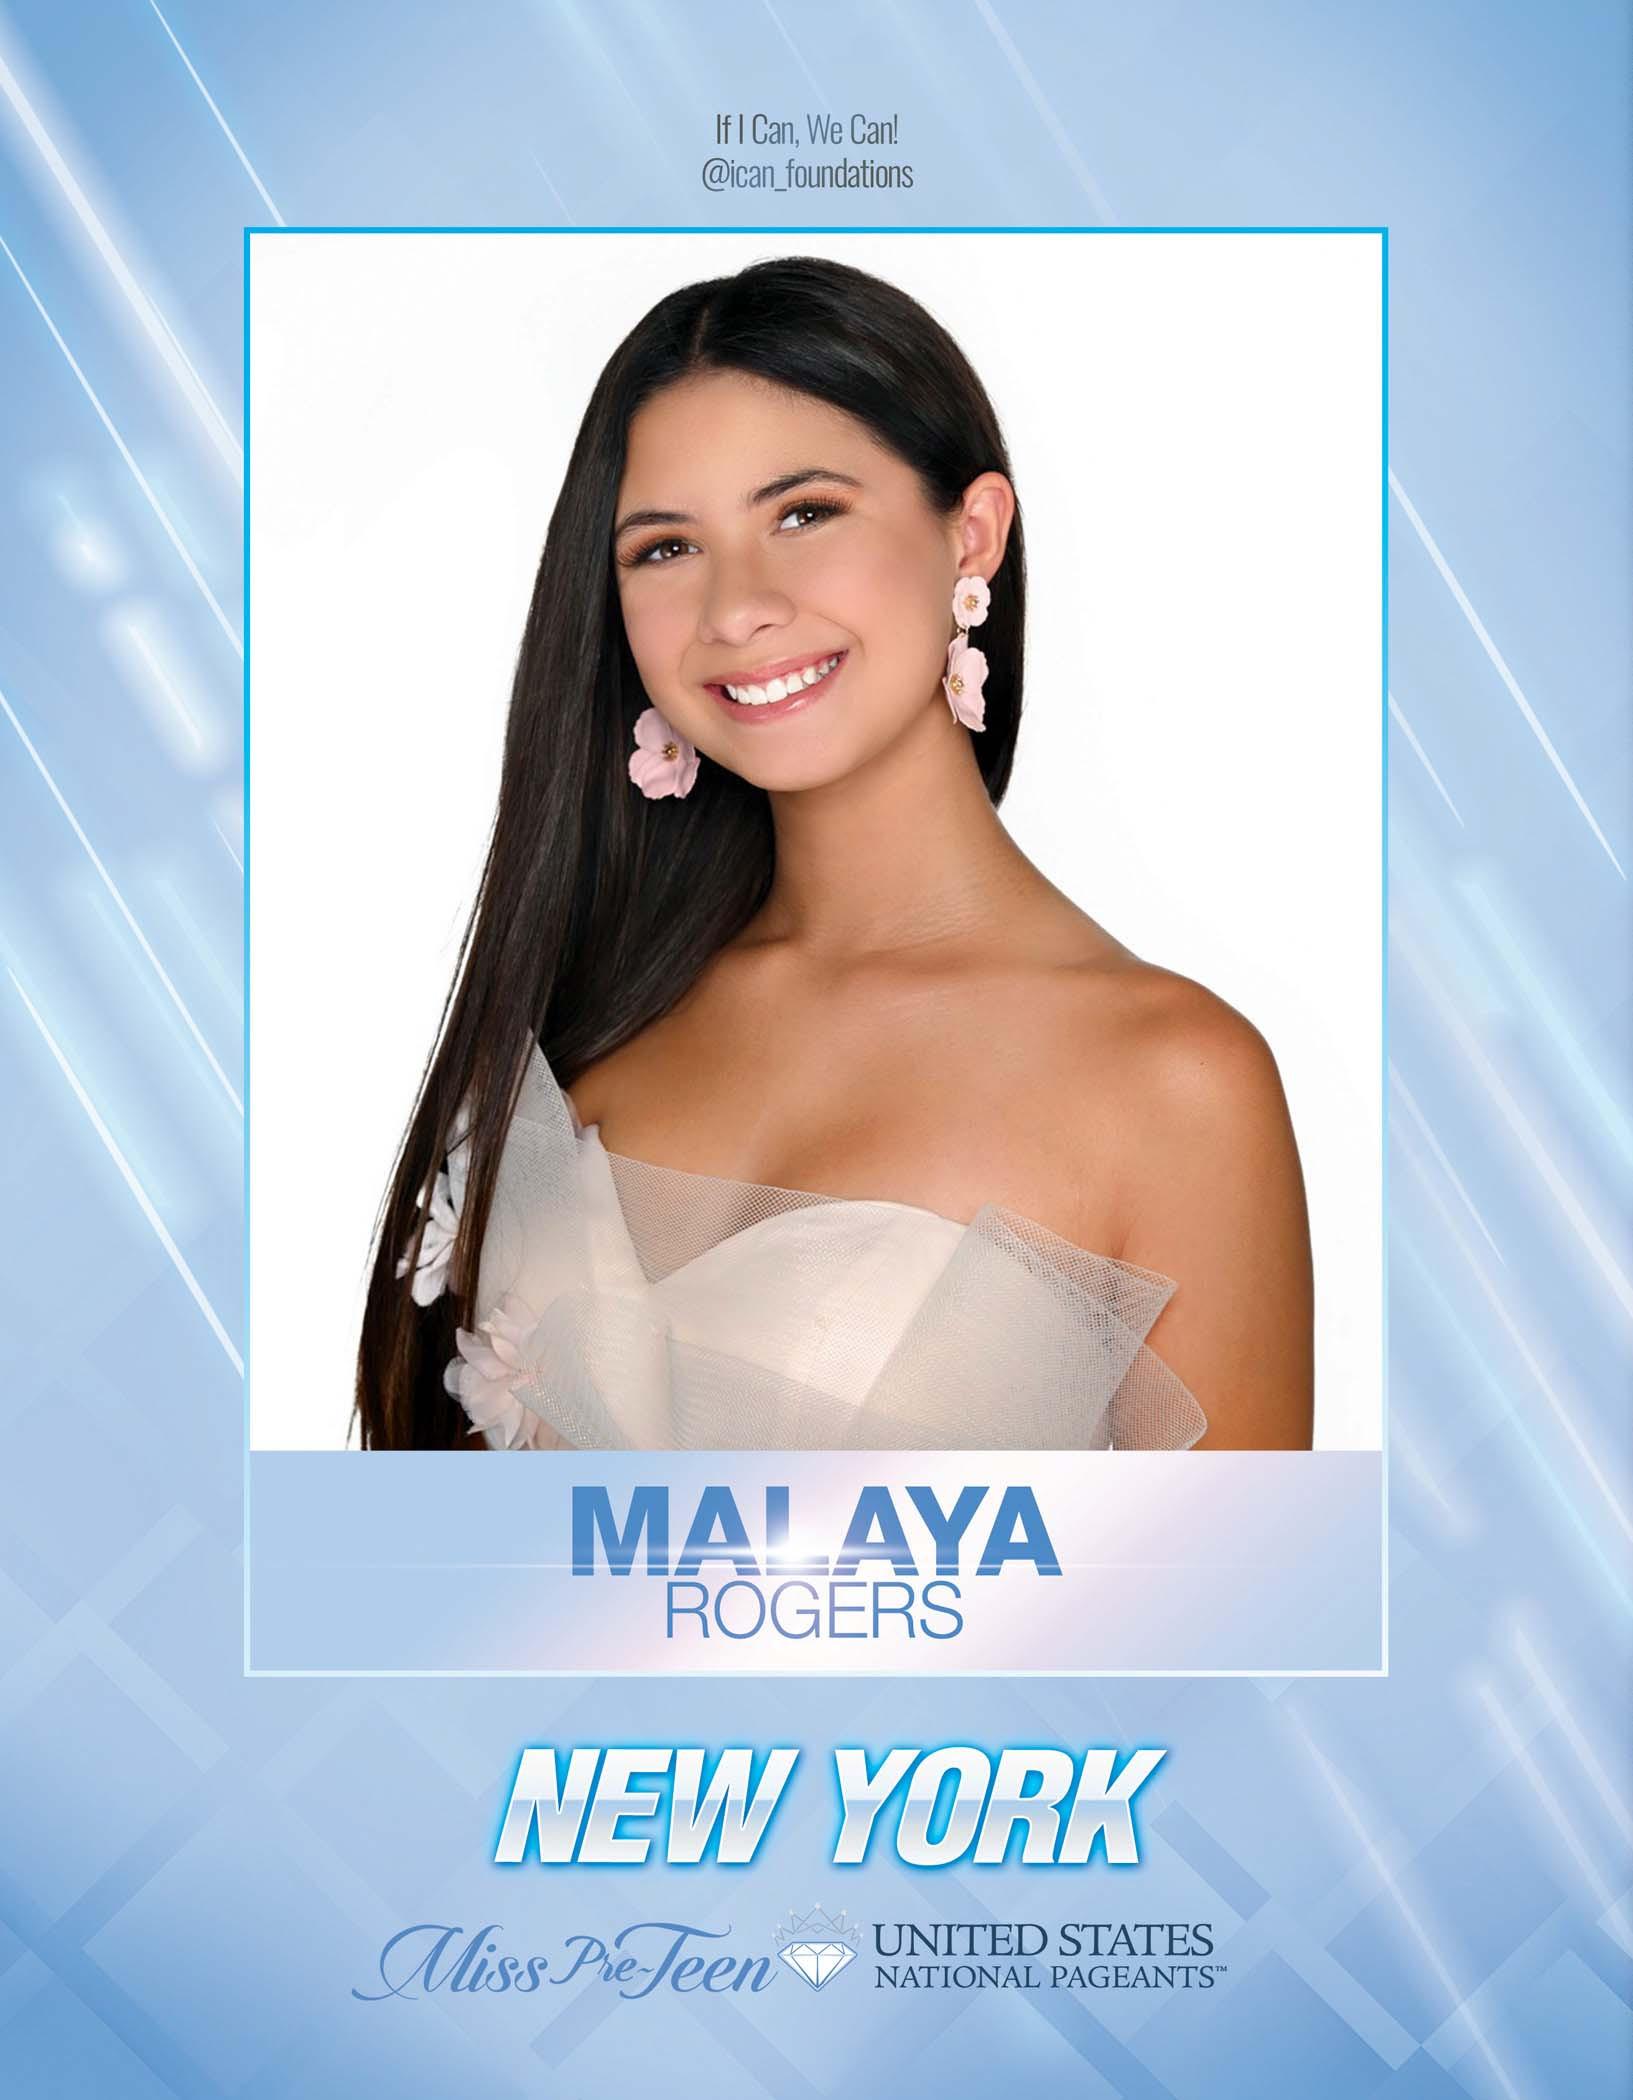 Malaya Rogers Miss Pre-Teen New York United States - 2021